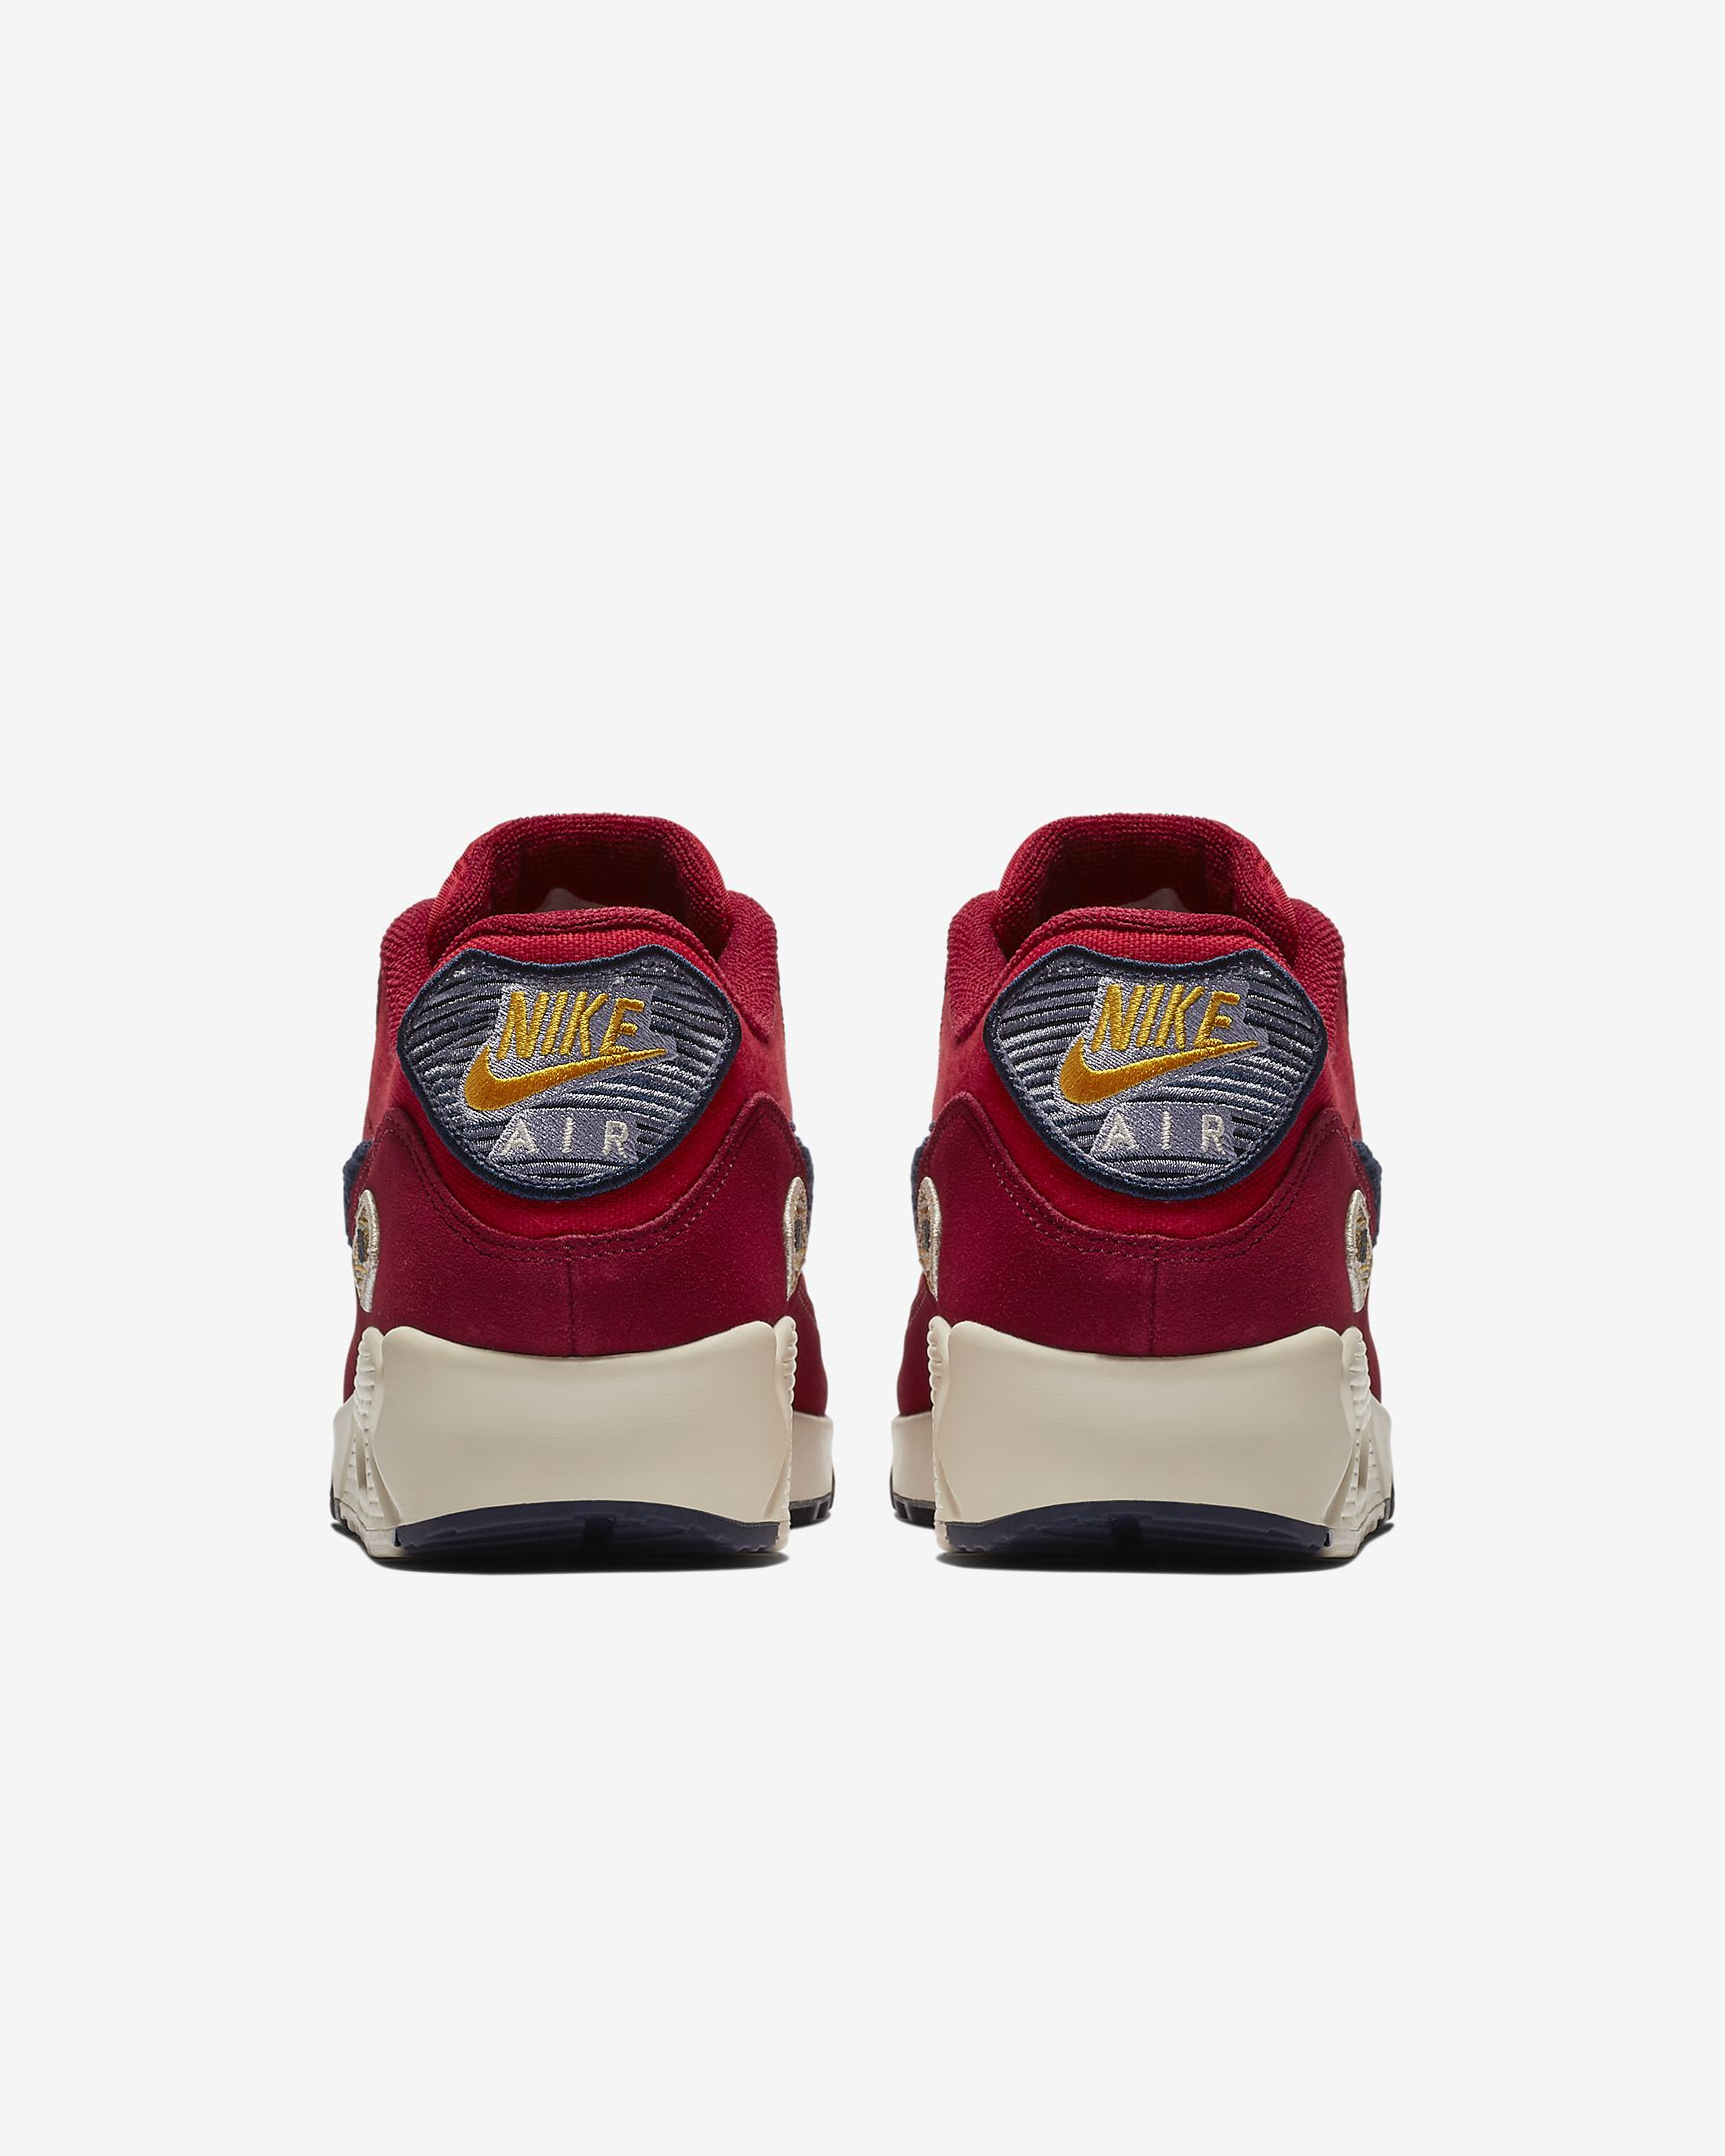 Nike Air Max 90 Chenille Swoosh rojo | 858954 600